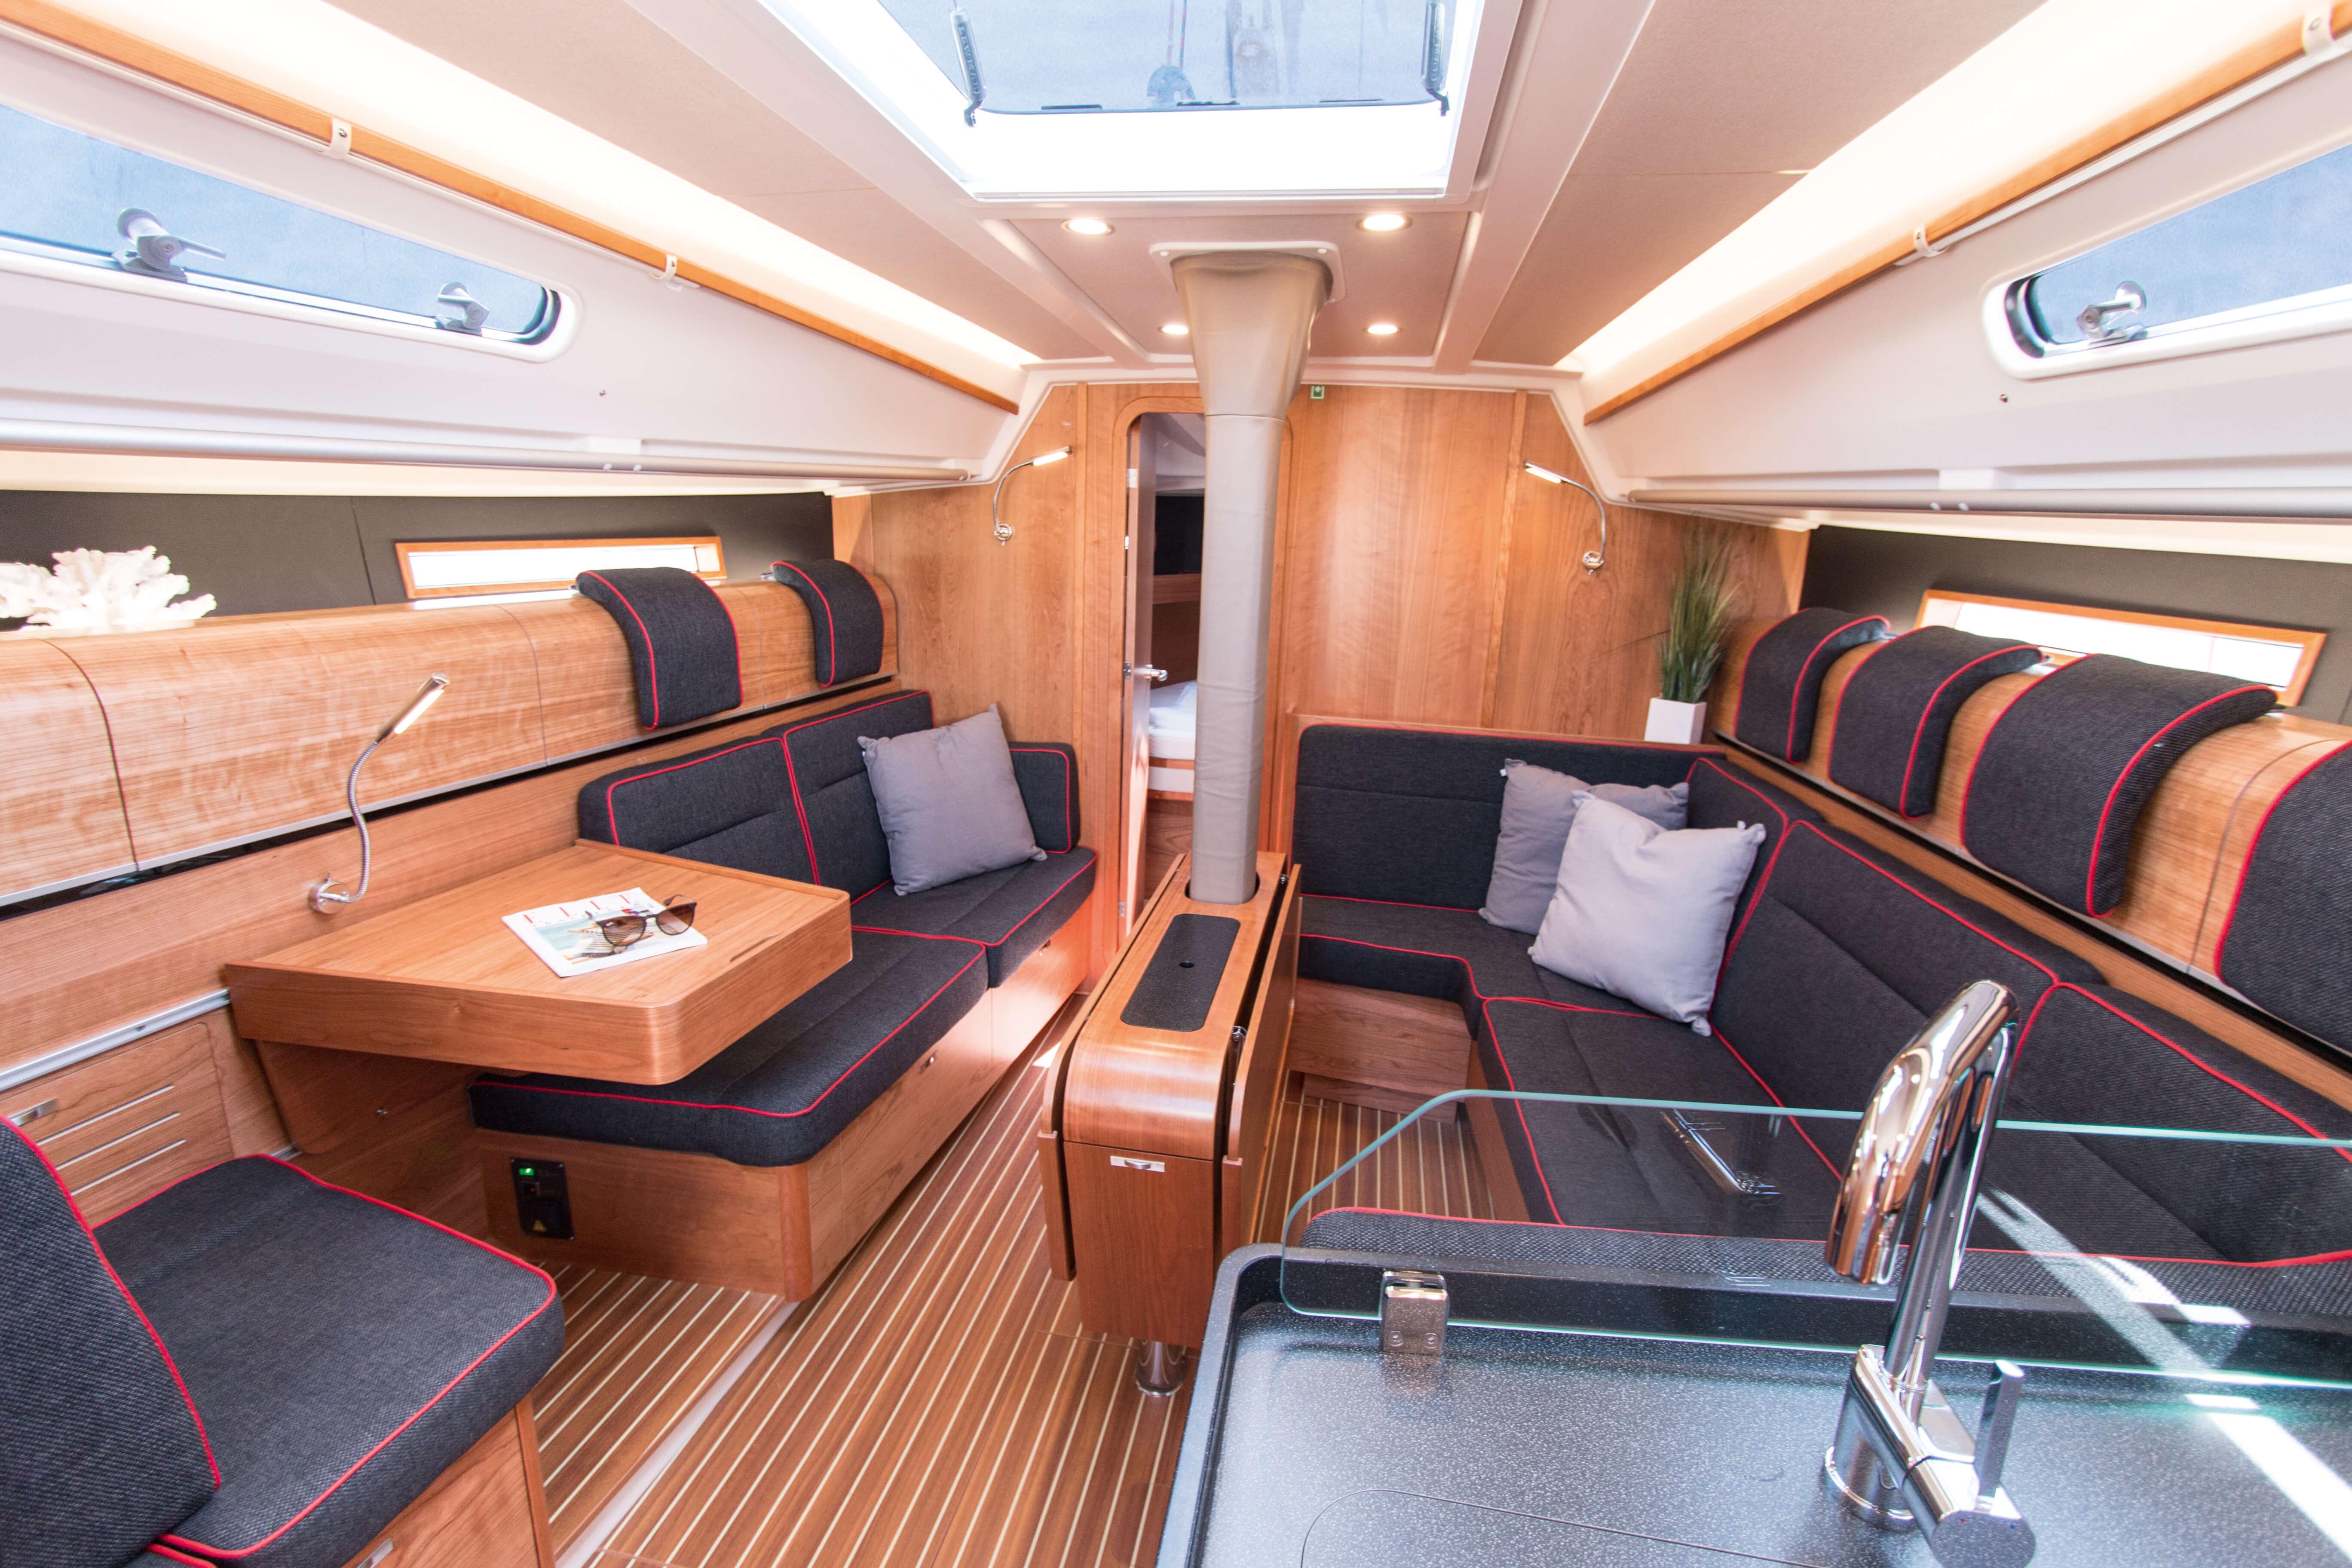 Dehler 42 Interior view lounge | sitting area, foldable table, window, deck hatch, bottle holder | Dehler